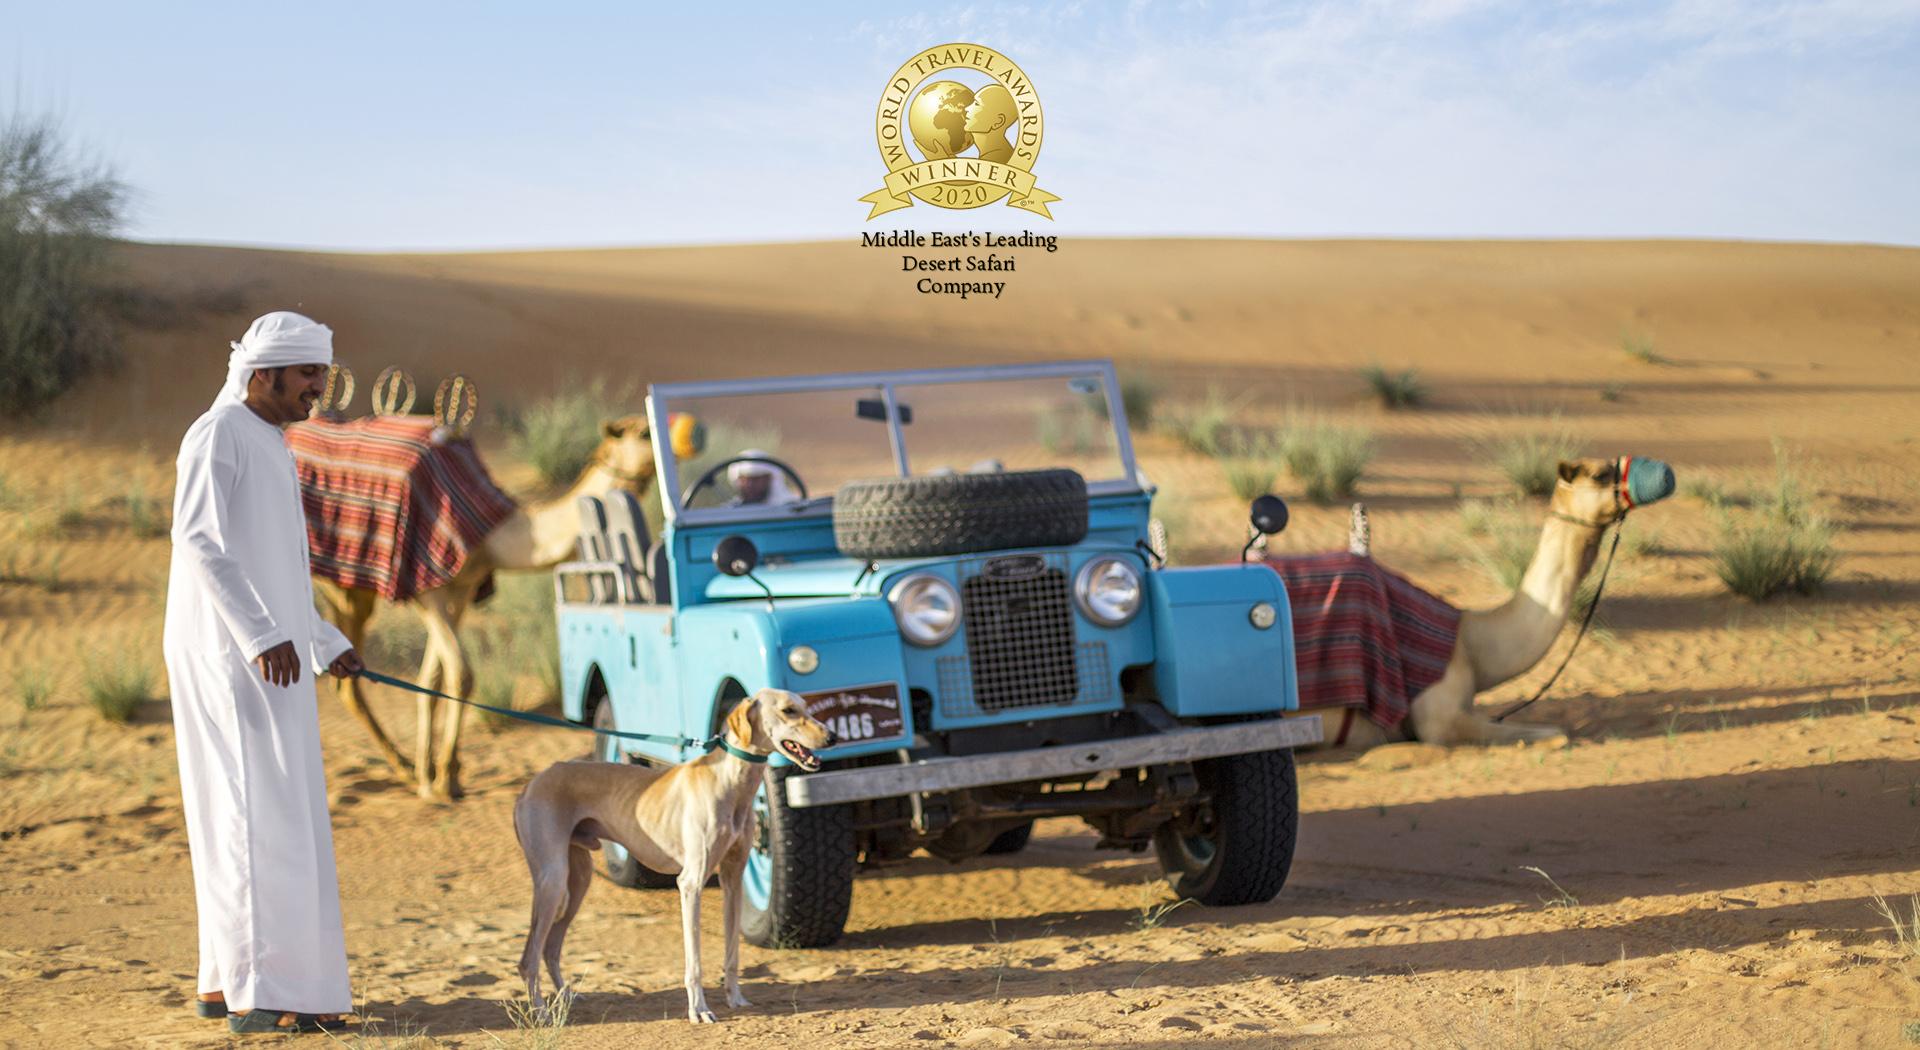 PLATINUM HERITAGE AWARDED MIDDLE EAST'S LEADING DESERT SAFARI COMPANY BY WORLD TRAVEL AWARDS